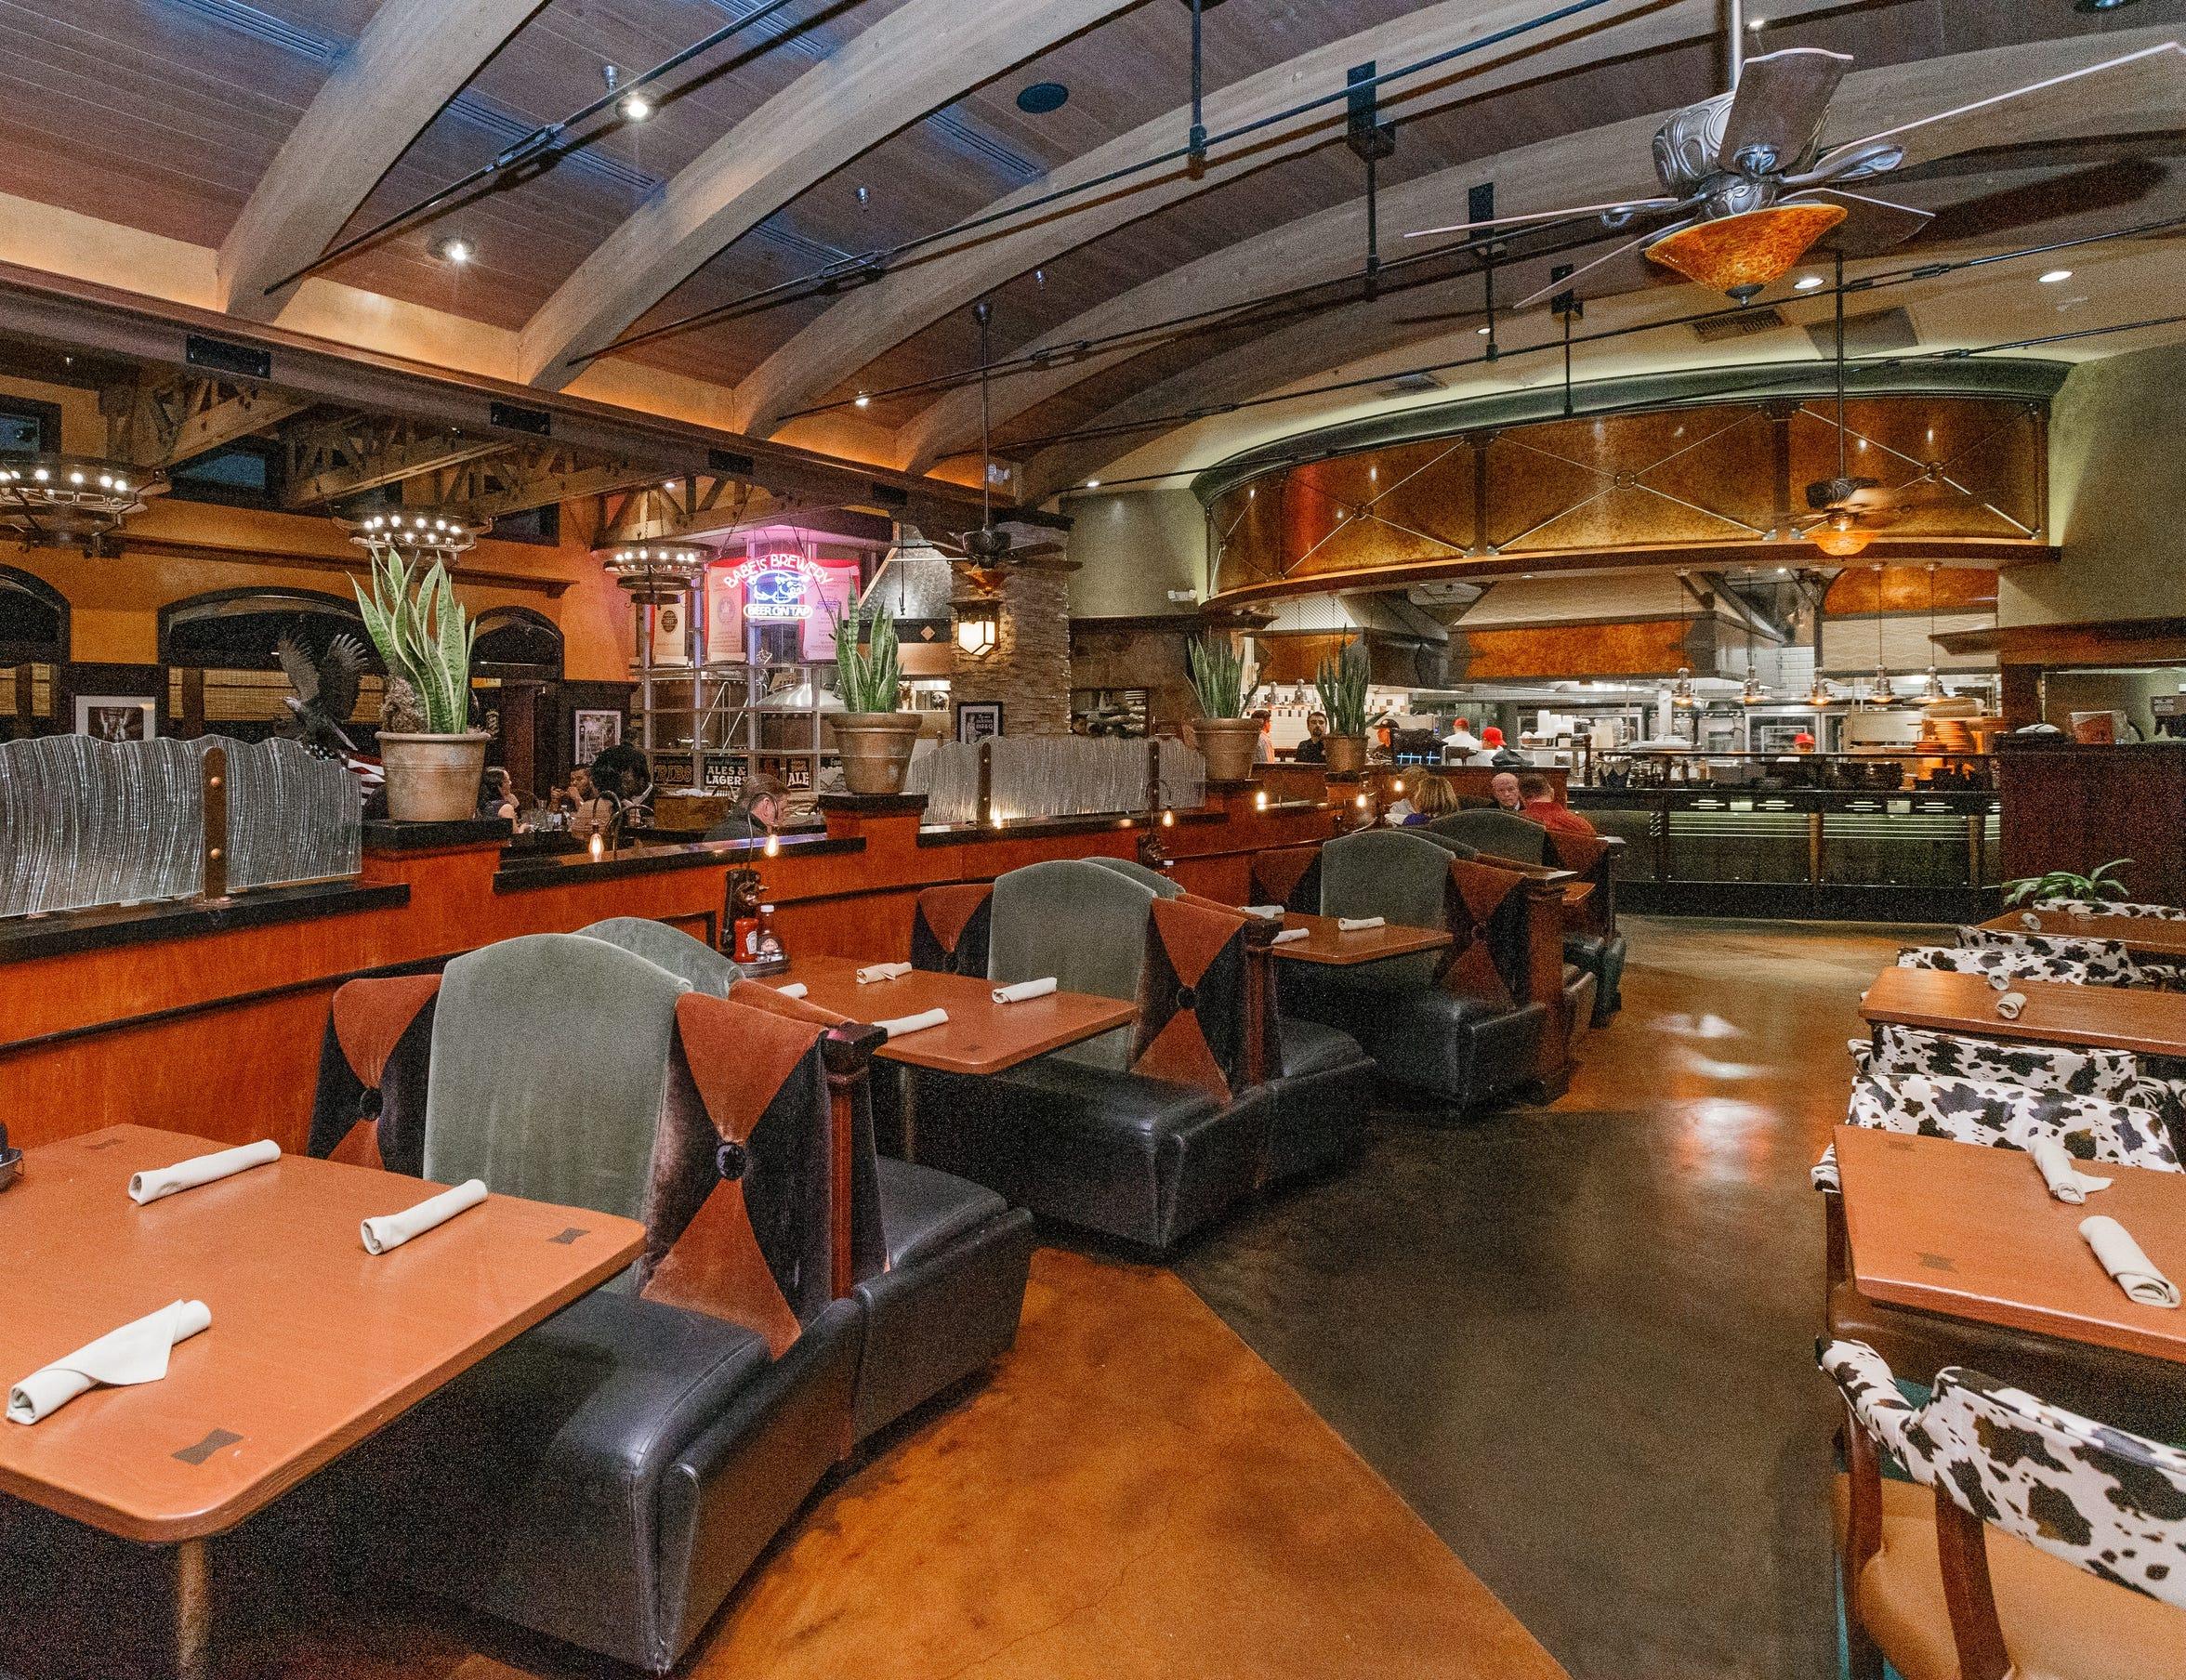 Babe's Bar-B-Que & Brewhouse